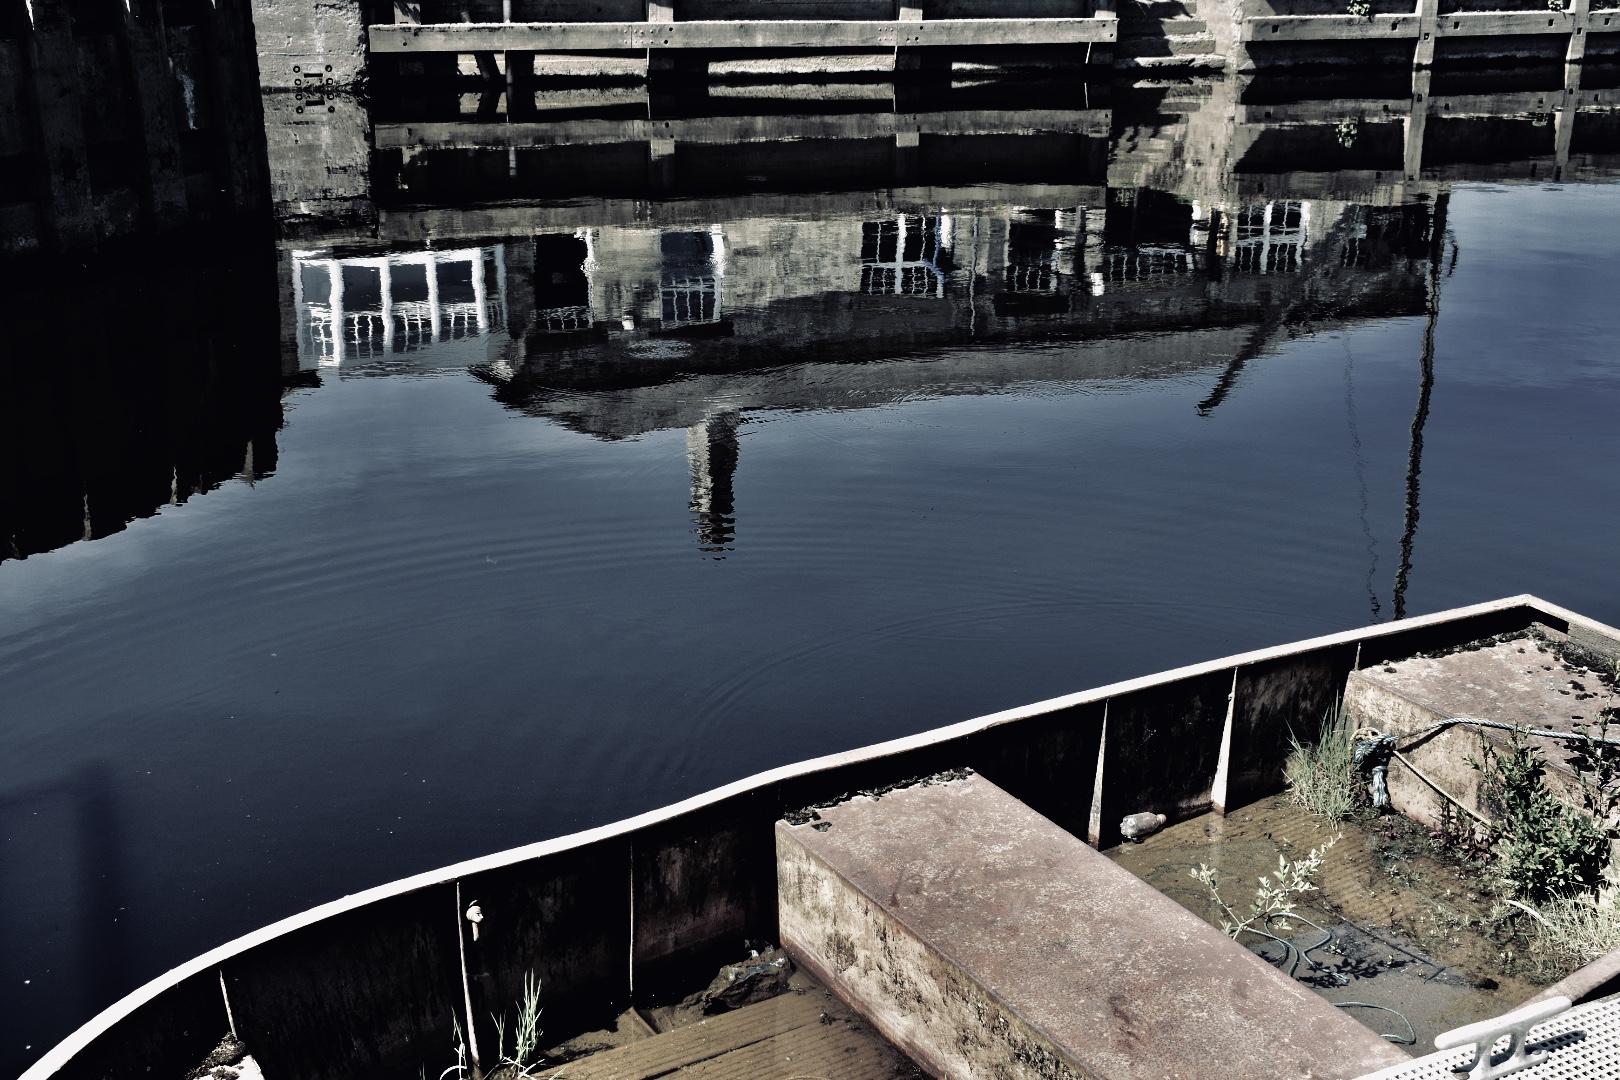 Nayburn Lock - York